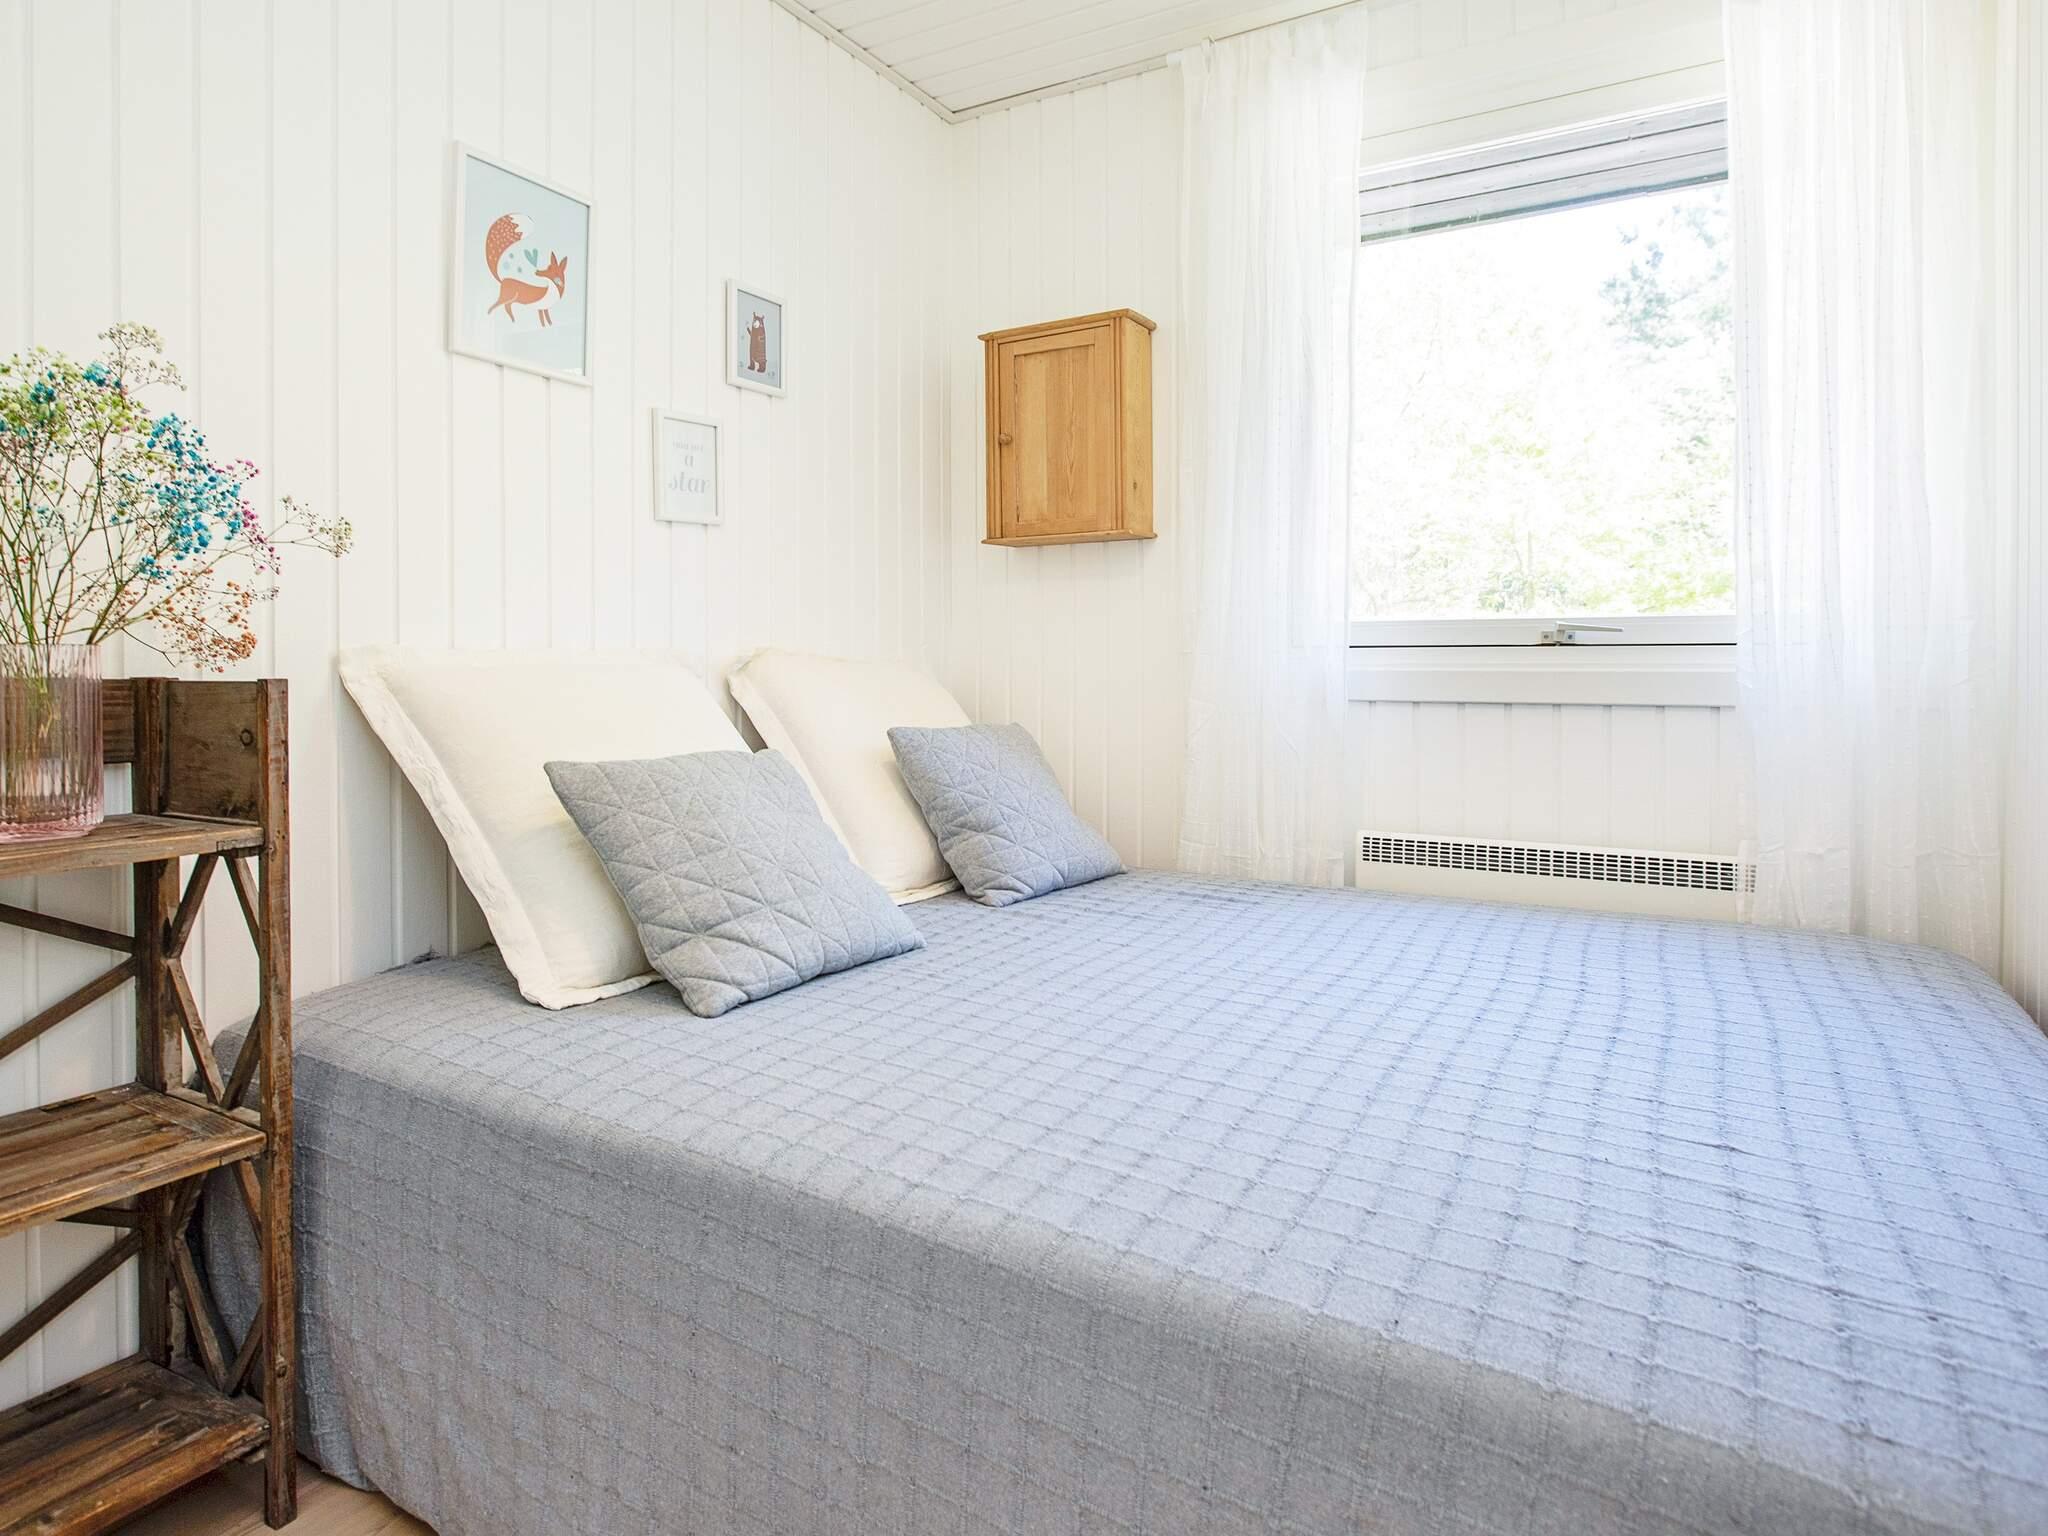 Ferienhaus Vig Lyng (2624325), Vig, , Westseeland, Dänemark, Bild 13